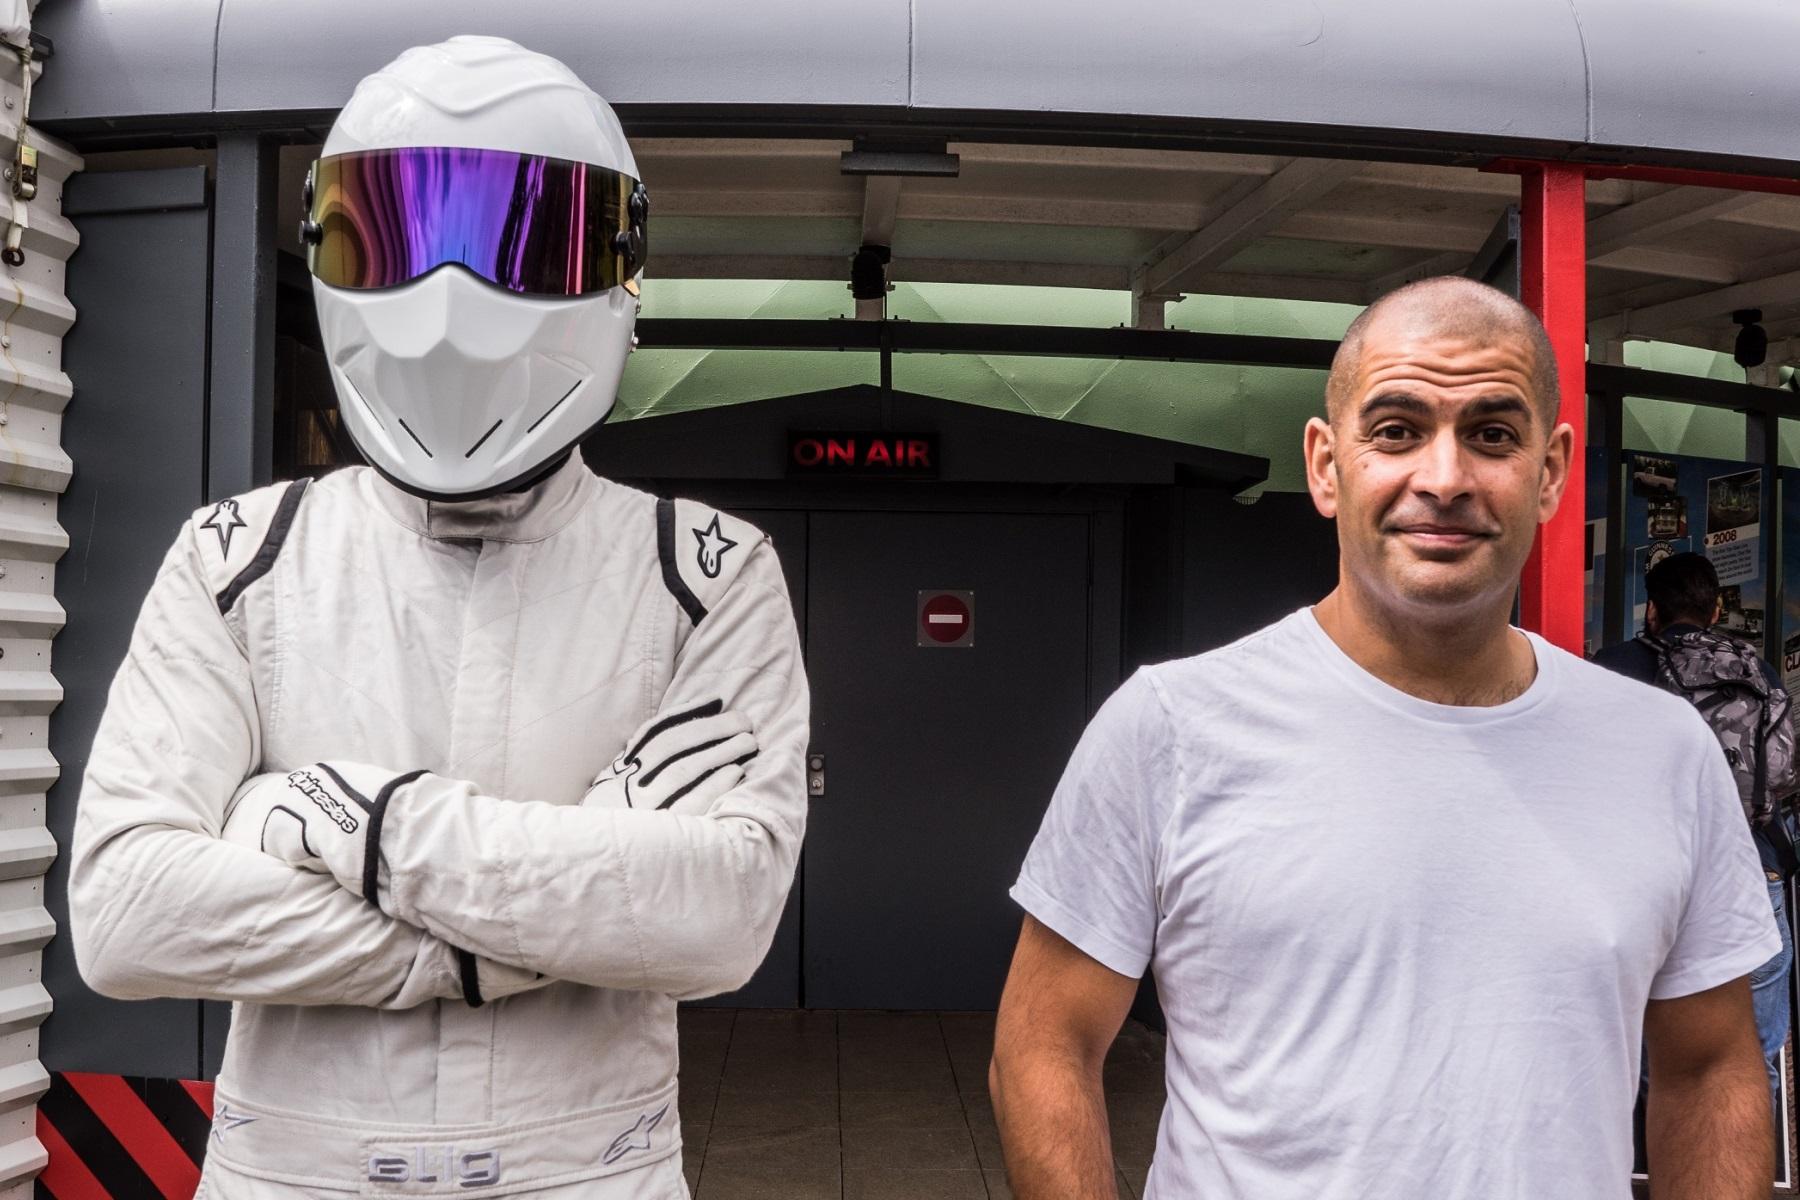 New look Top Gear attraction opens at Beaulieu Automotive Blog